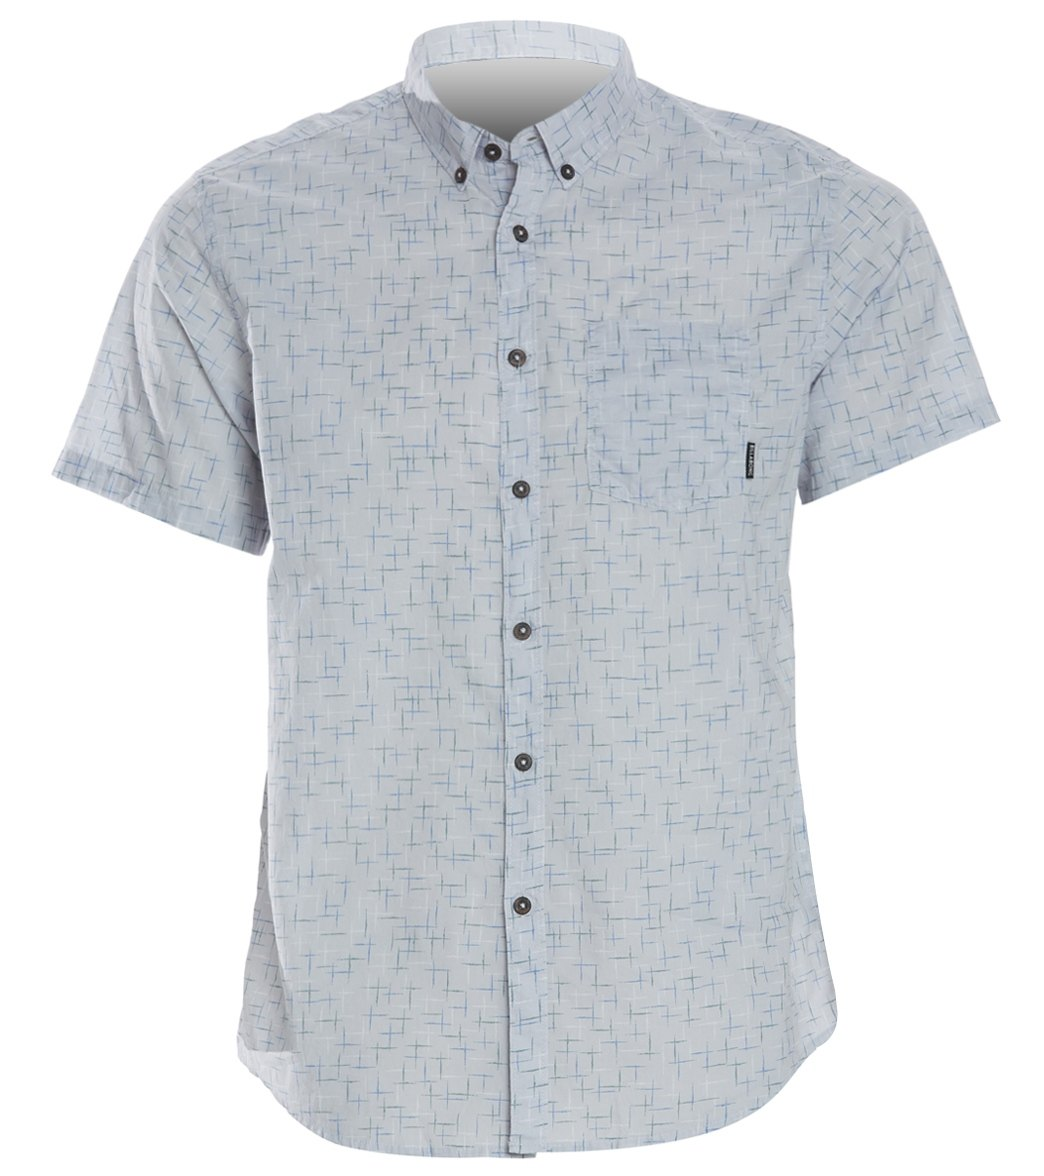 Billabong Mens Sundays Mini Short Sleeve Top